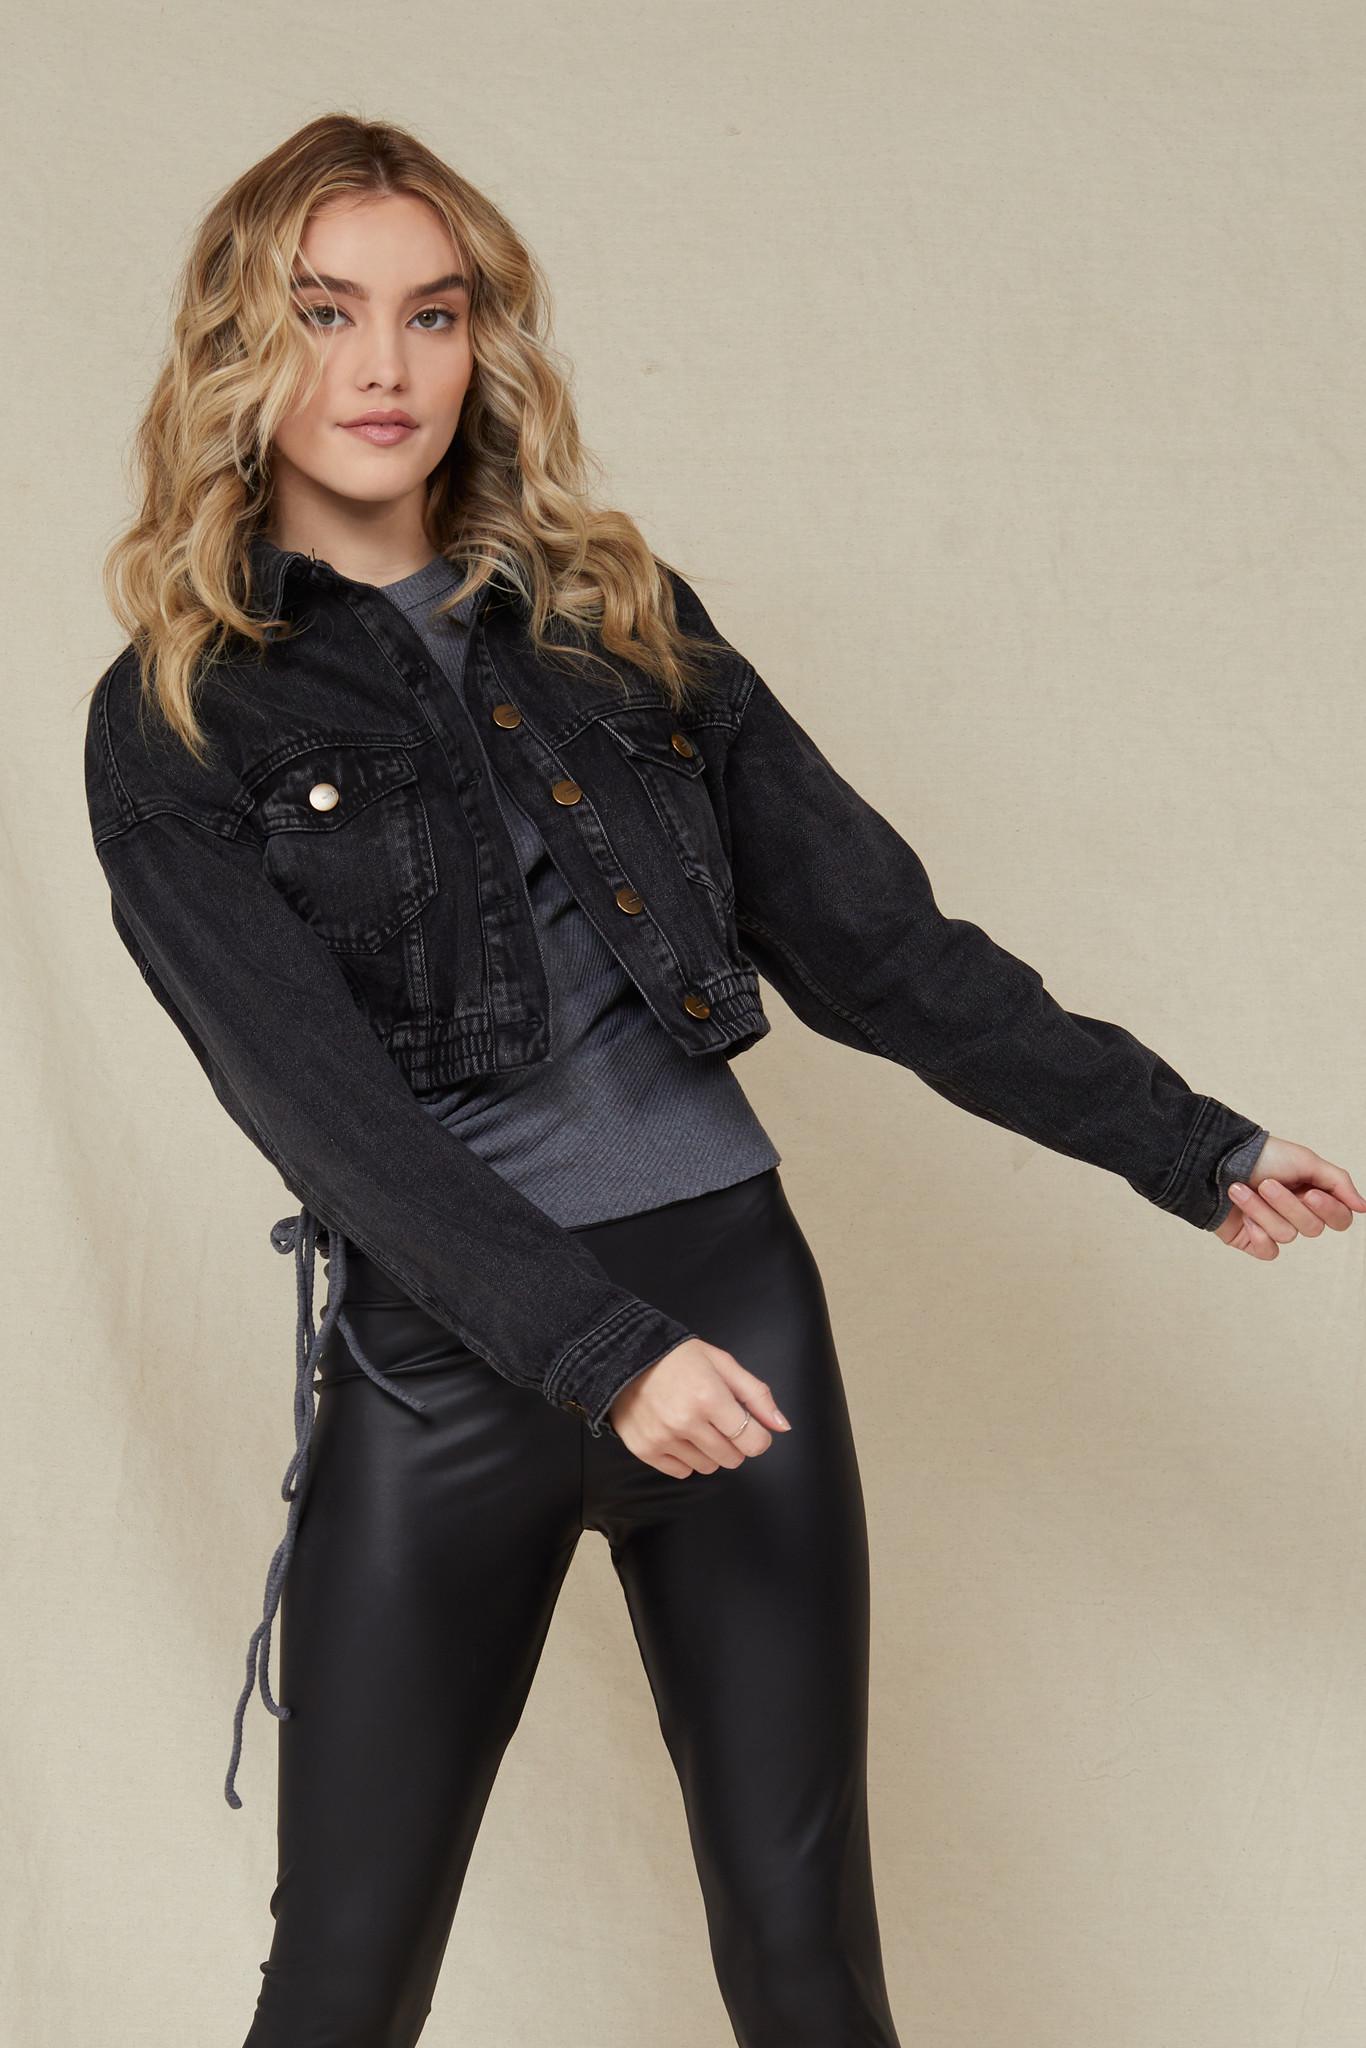 Lightweight Rumors Black Denim Jacket